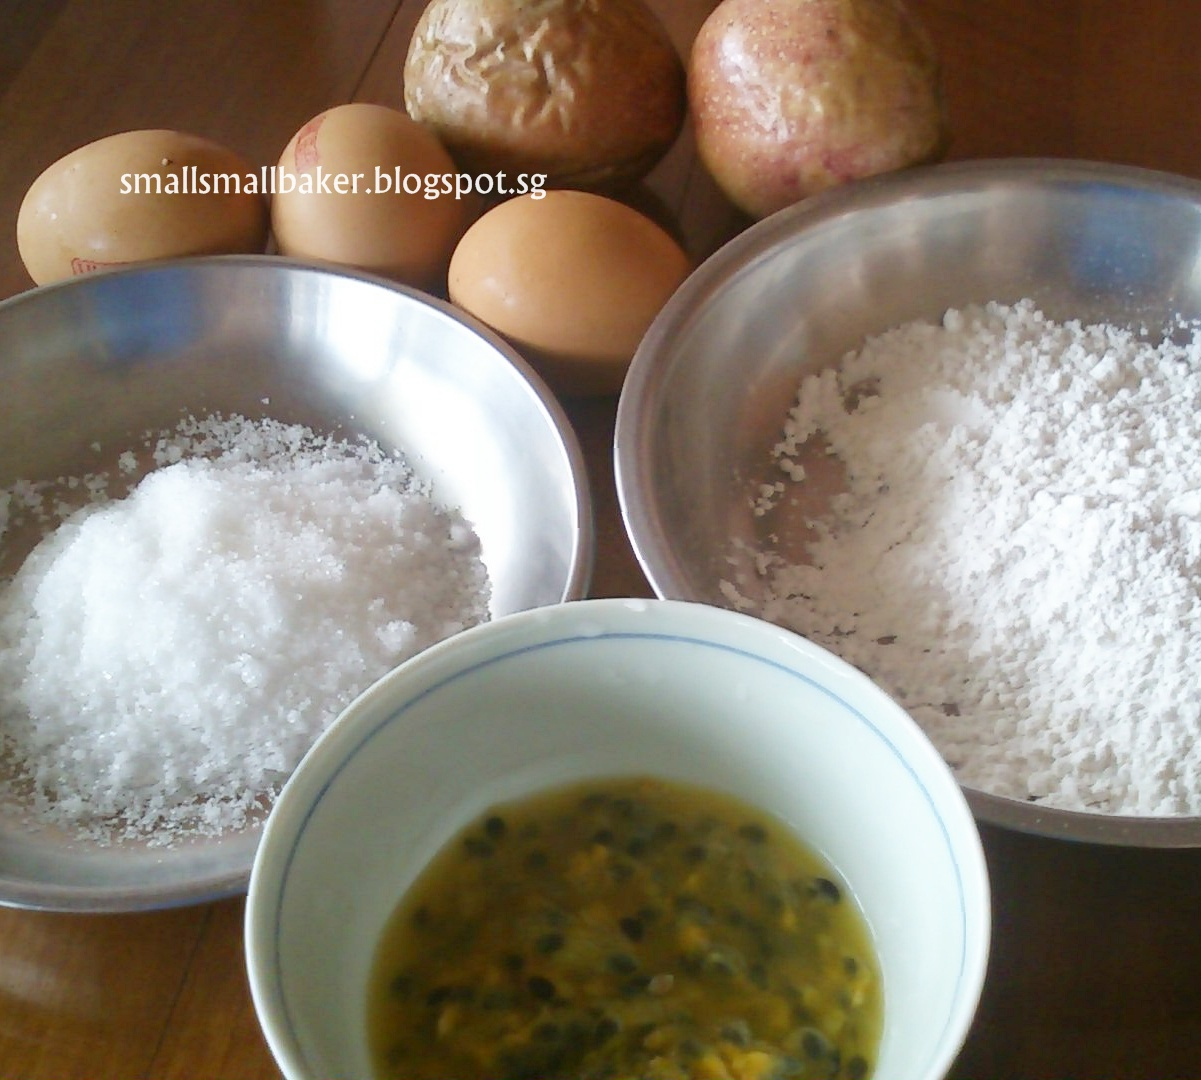 Baking Tin For Chiffon Cake